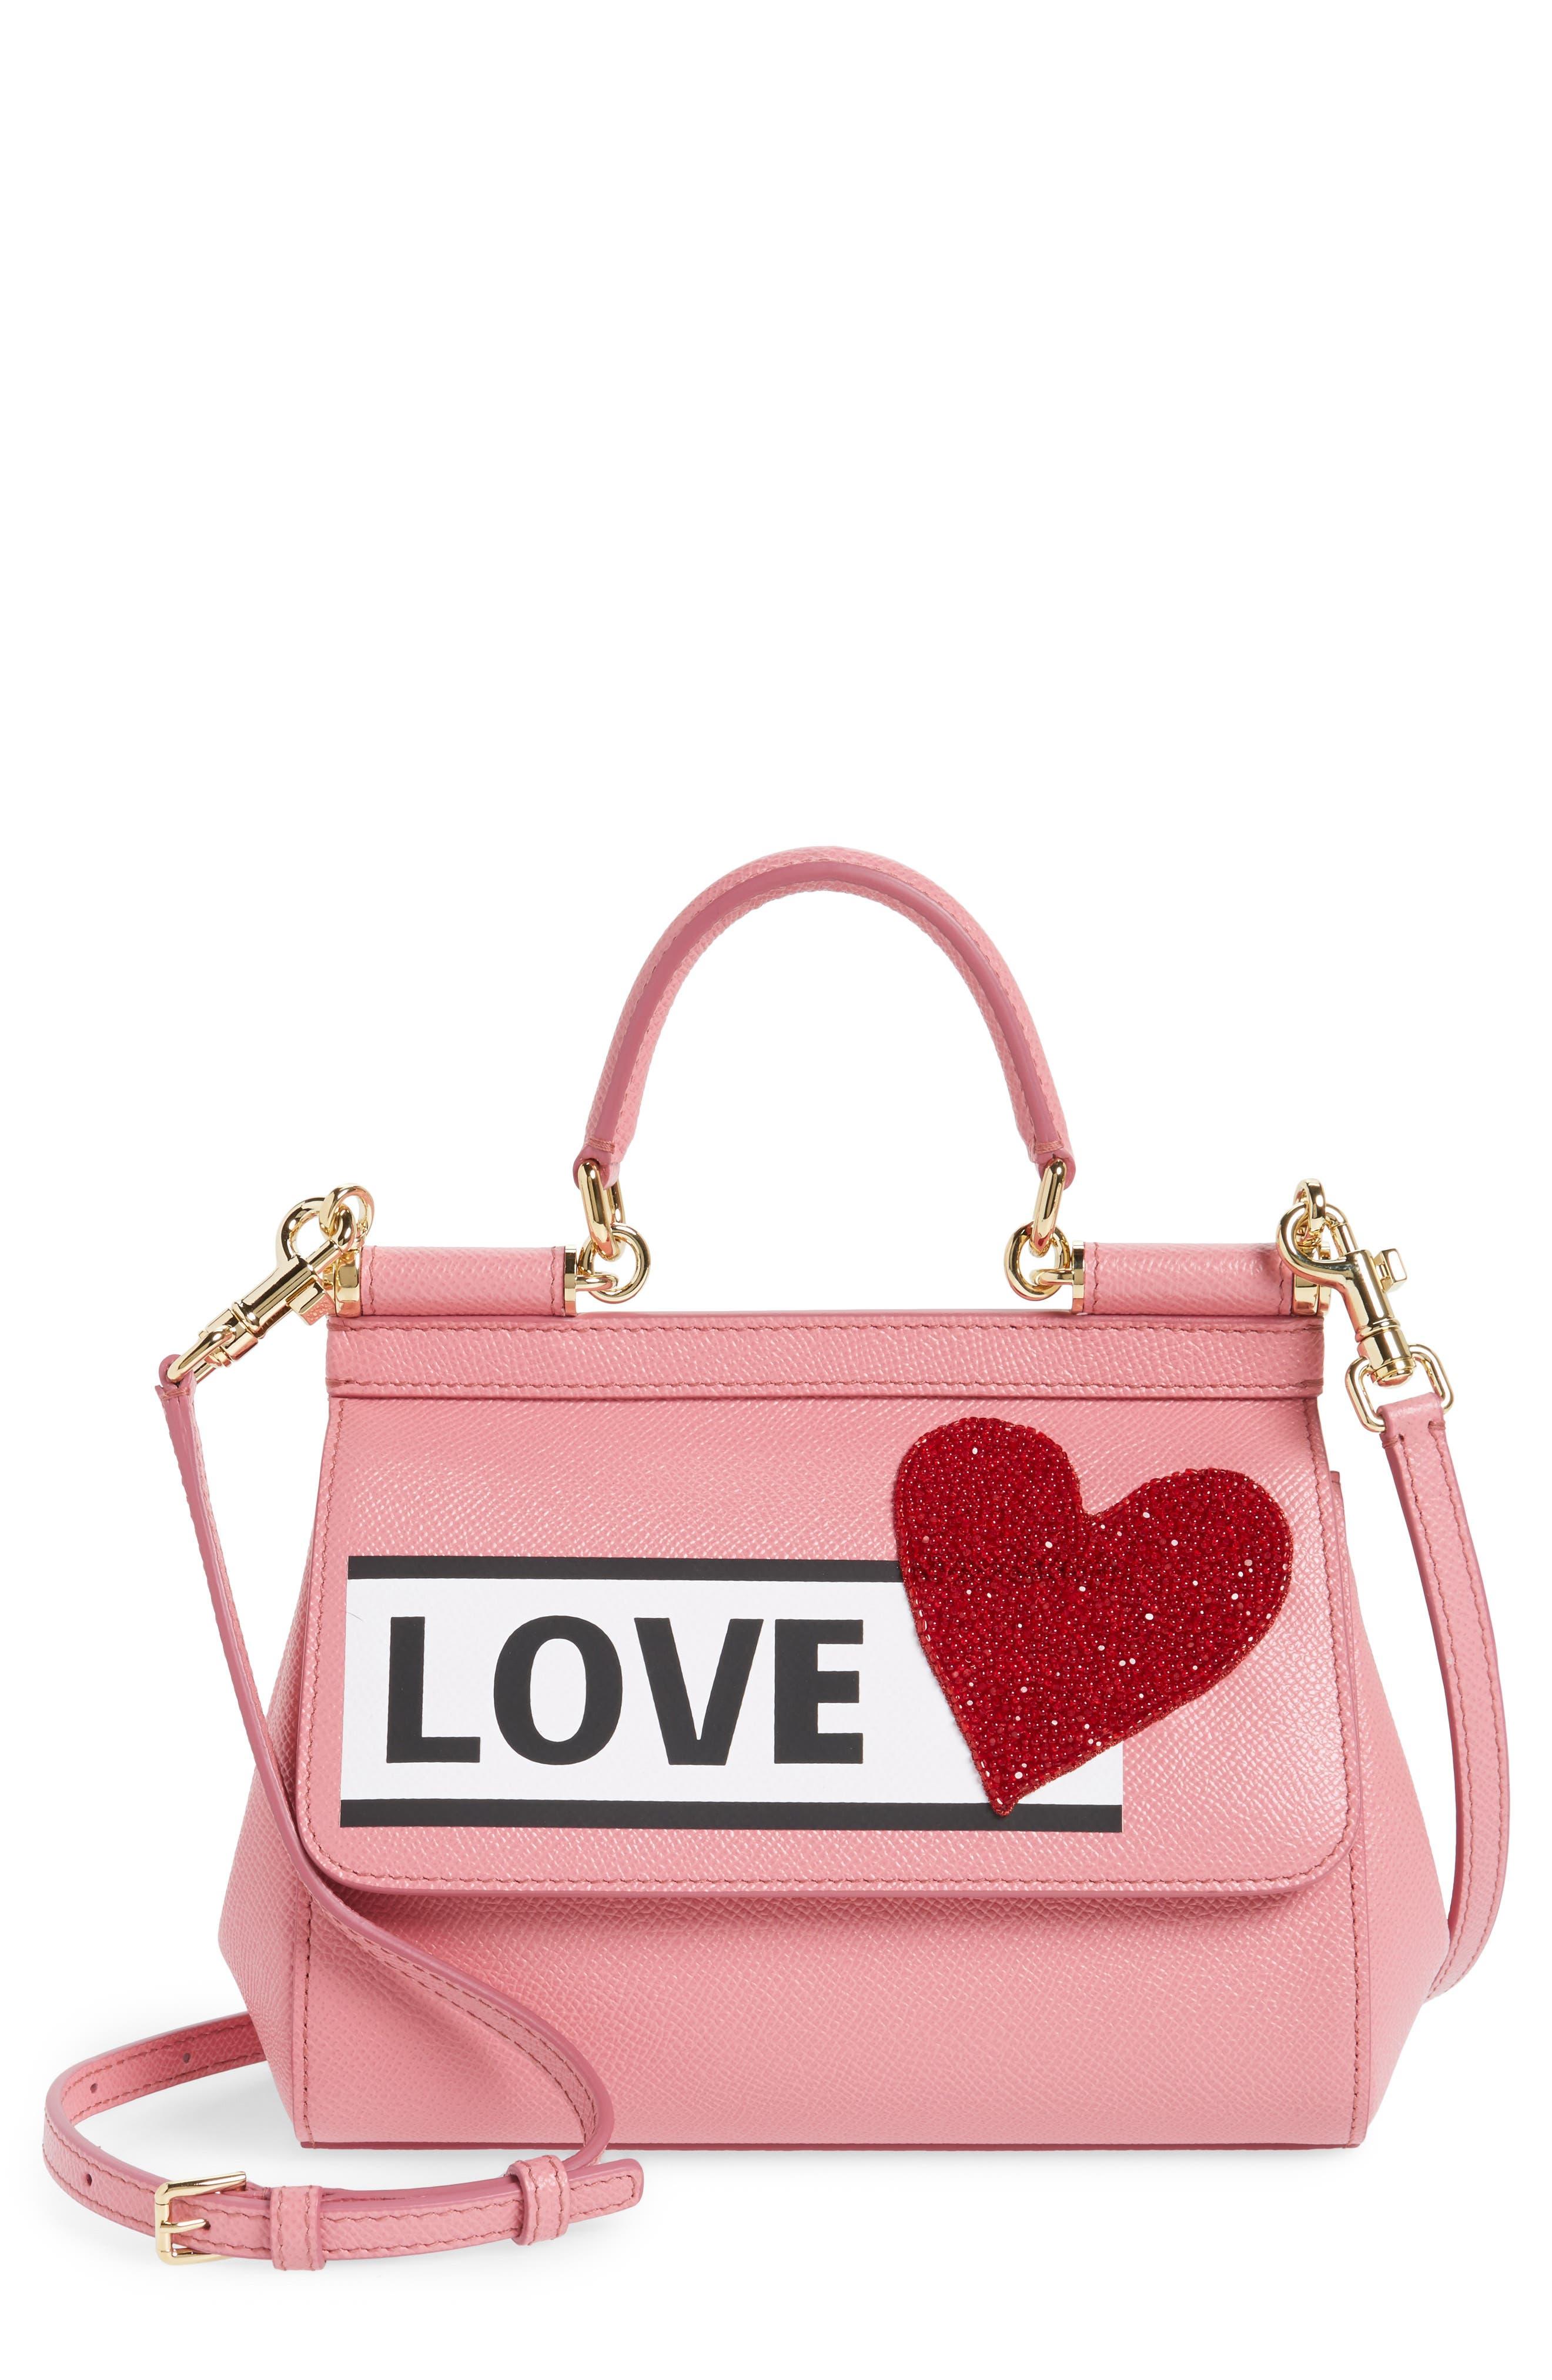 Dolce&Gabbana Small Miss Sicily - Love Leather Satchel